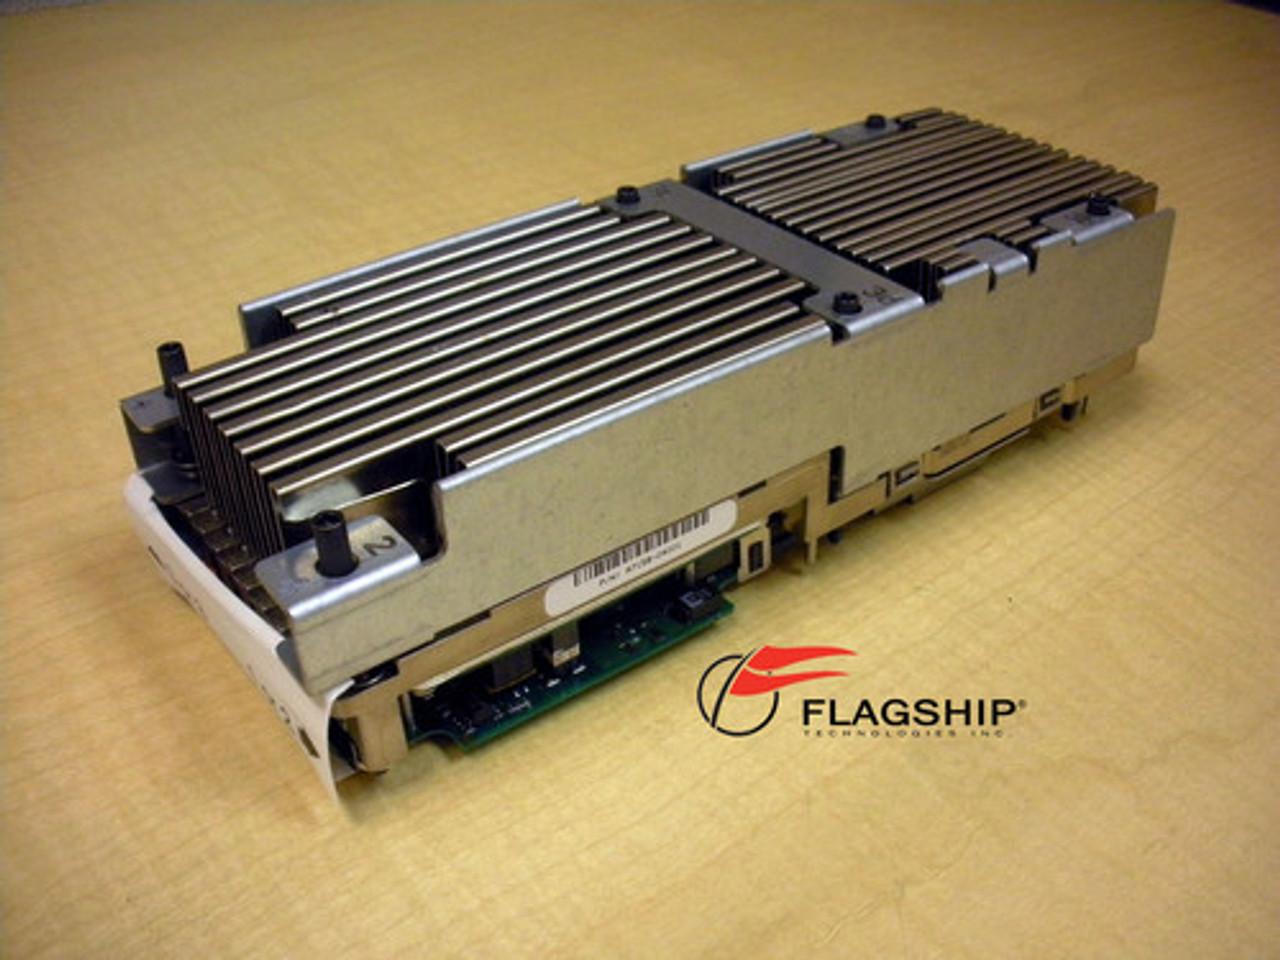 HP Integrity rx4640 Servers